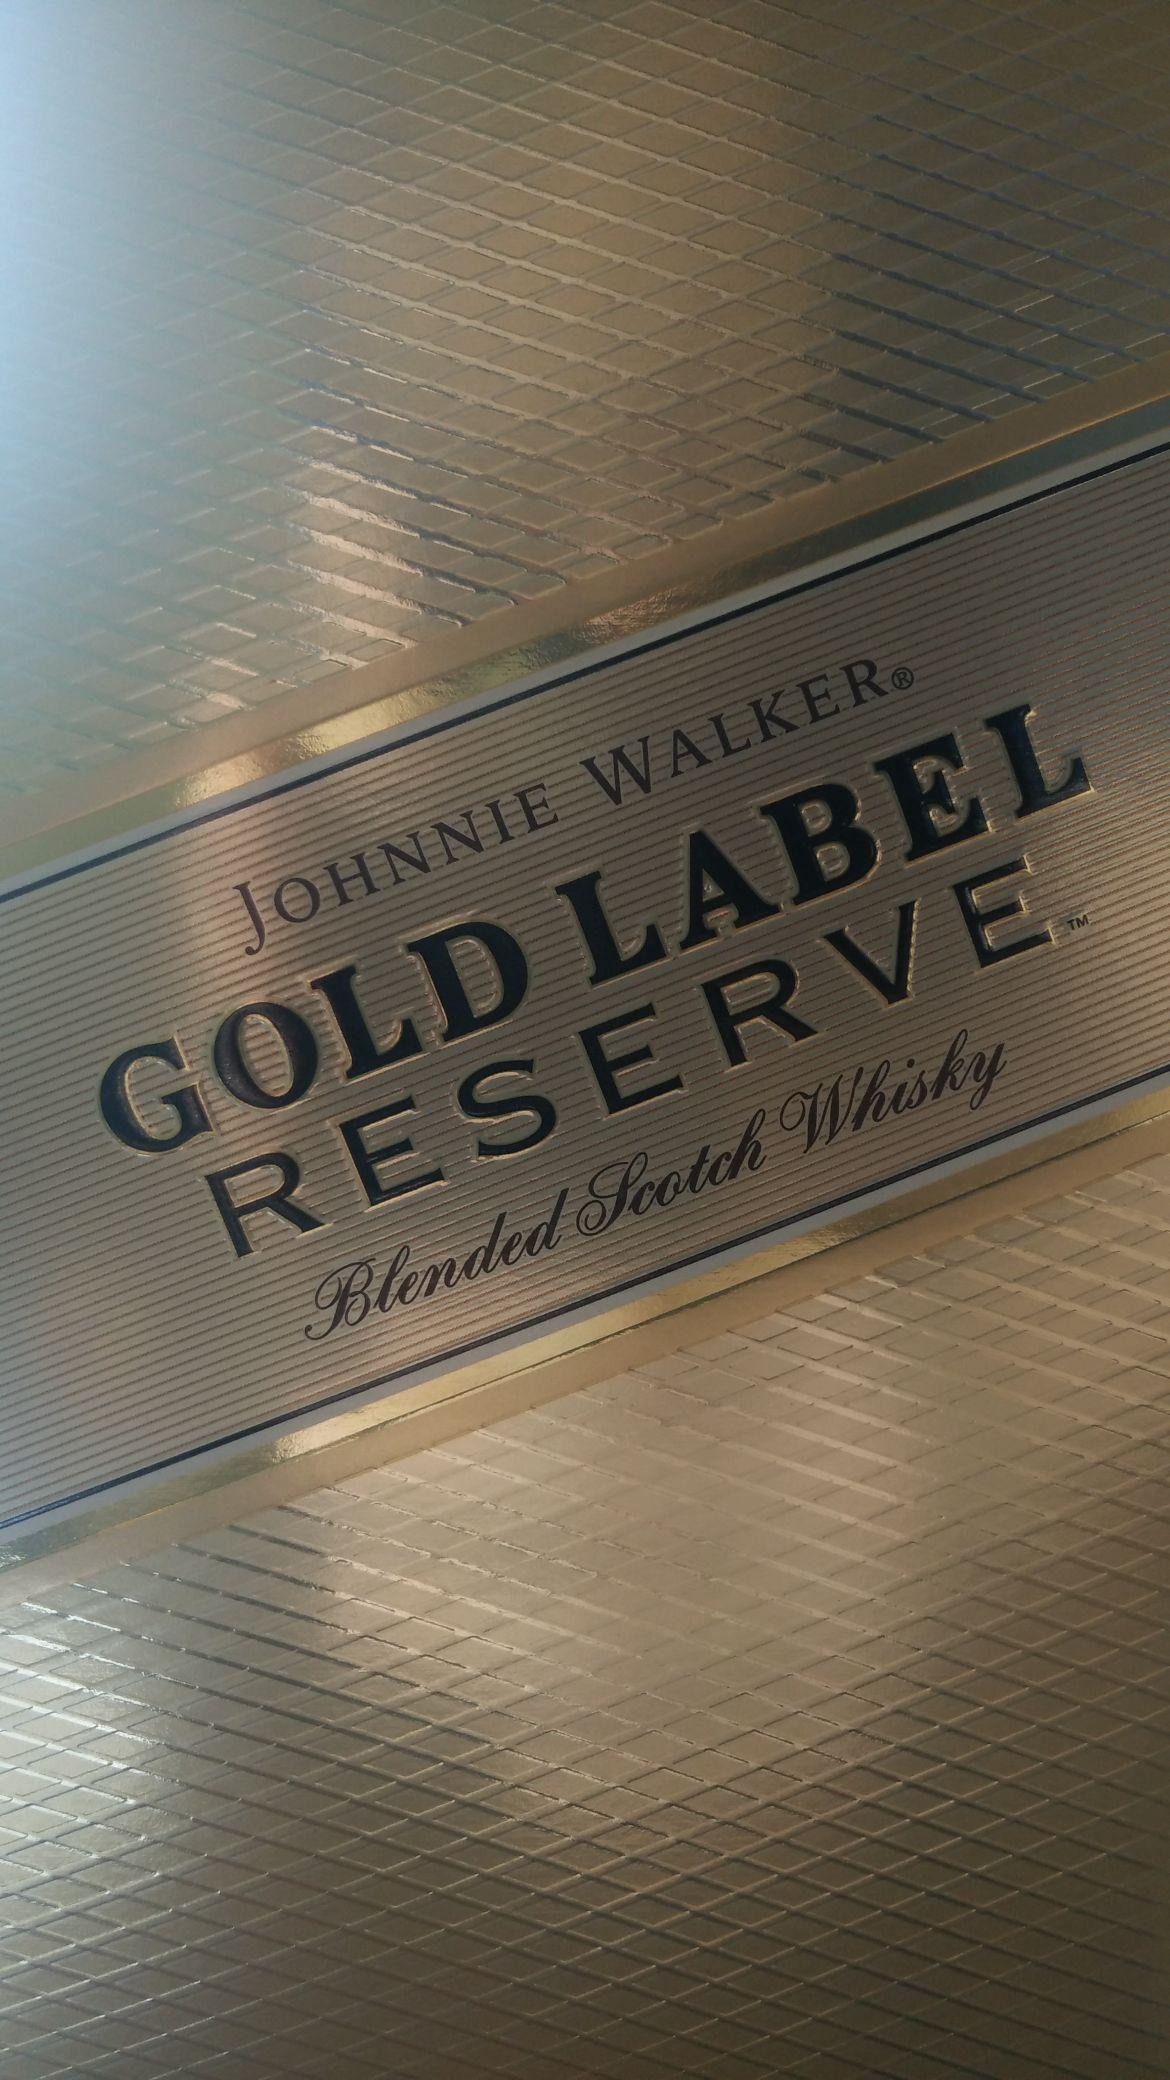 Johnnie Walker Golden Label Reserve 0,7 za 129,9 w Gagalonie na Śląsku.